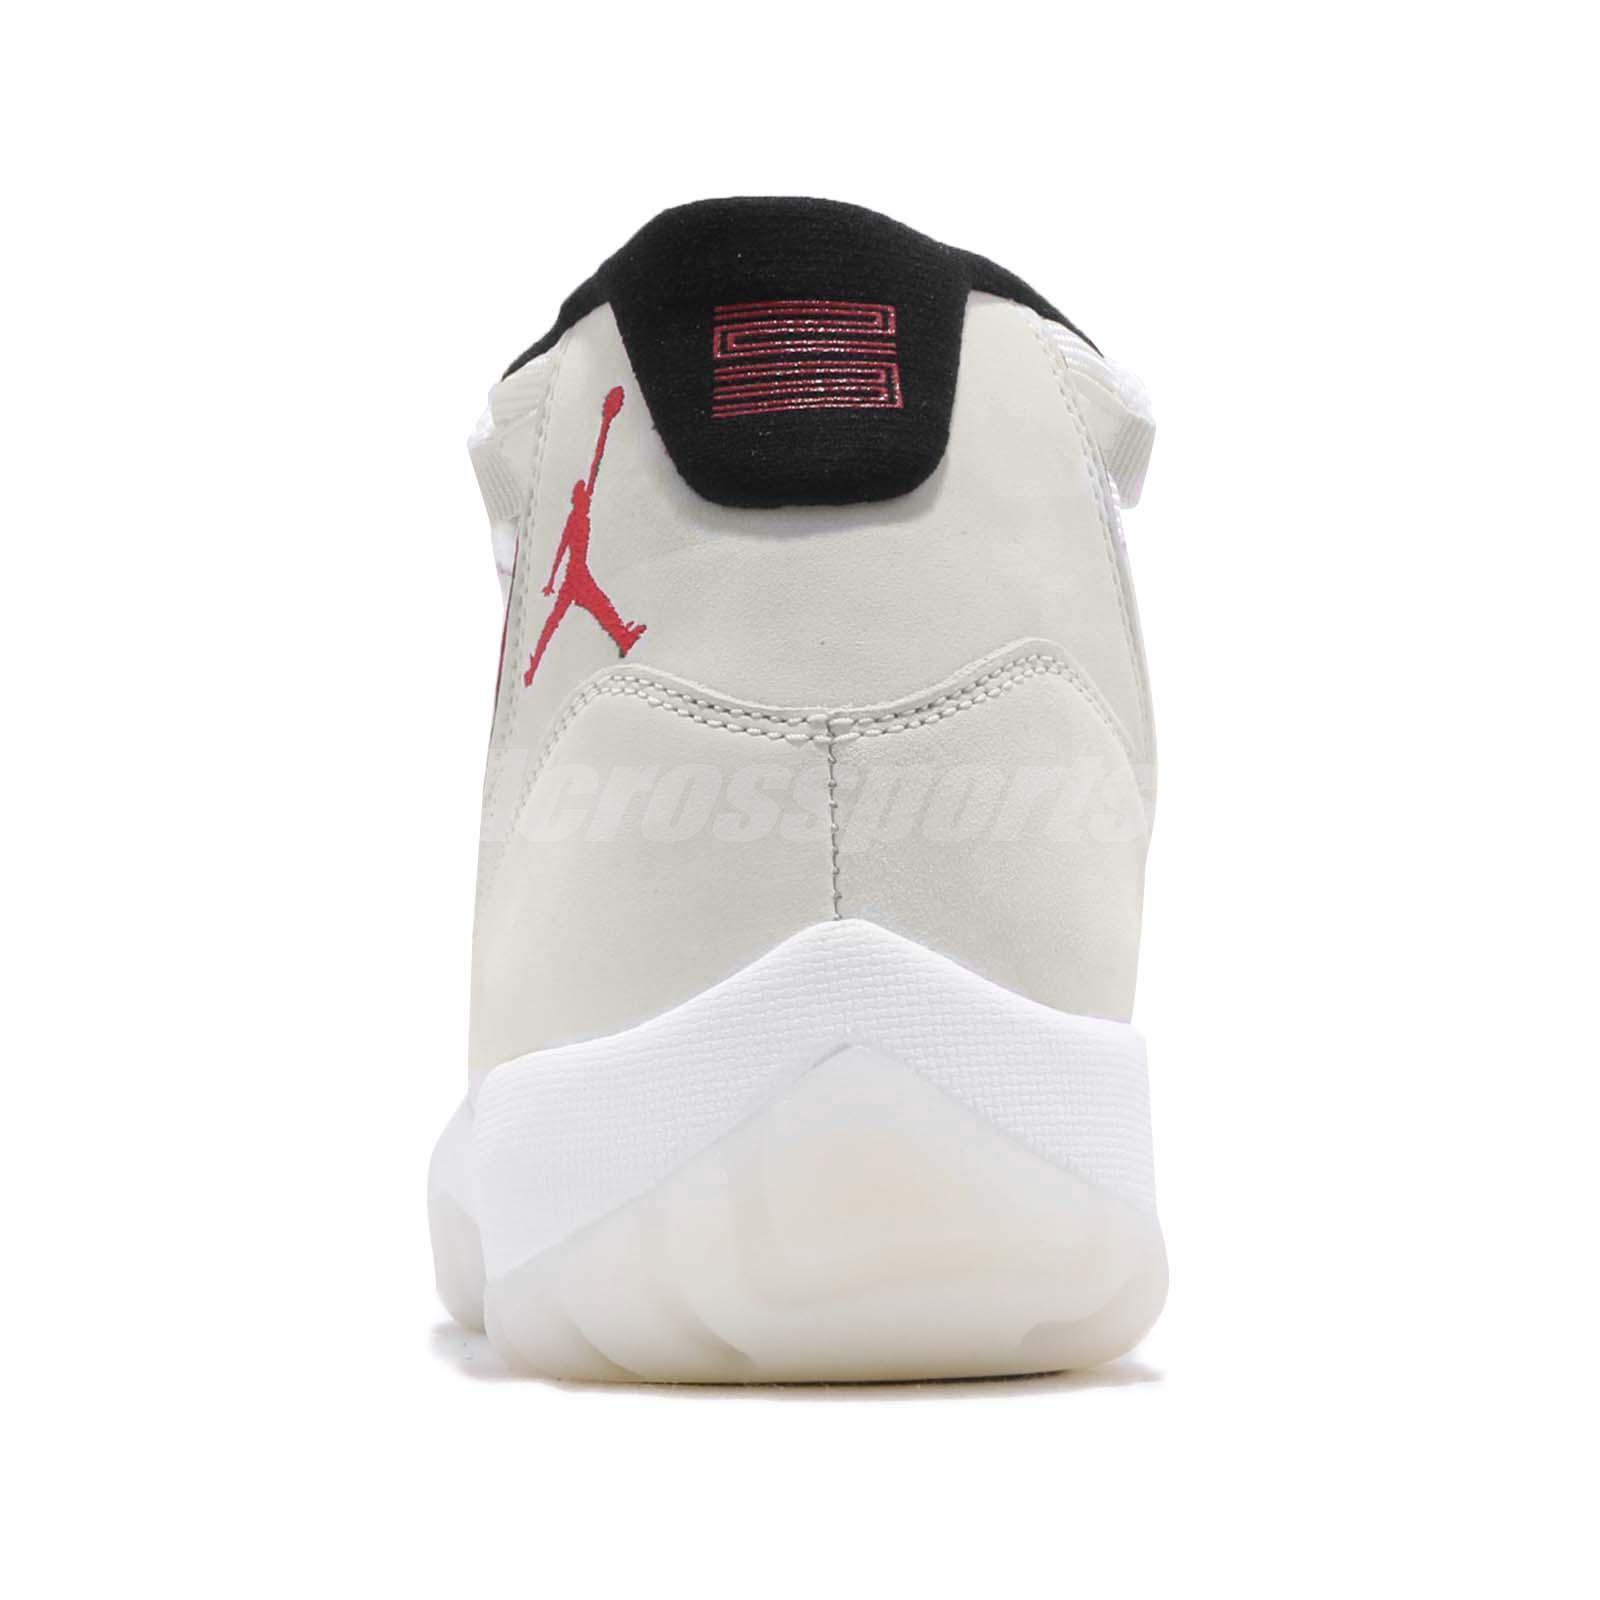 more photos 1c409 6f414 Nike Air Jordan 11 Retro Platinum Tint Sail University Red XI AJ11 ...